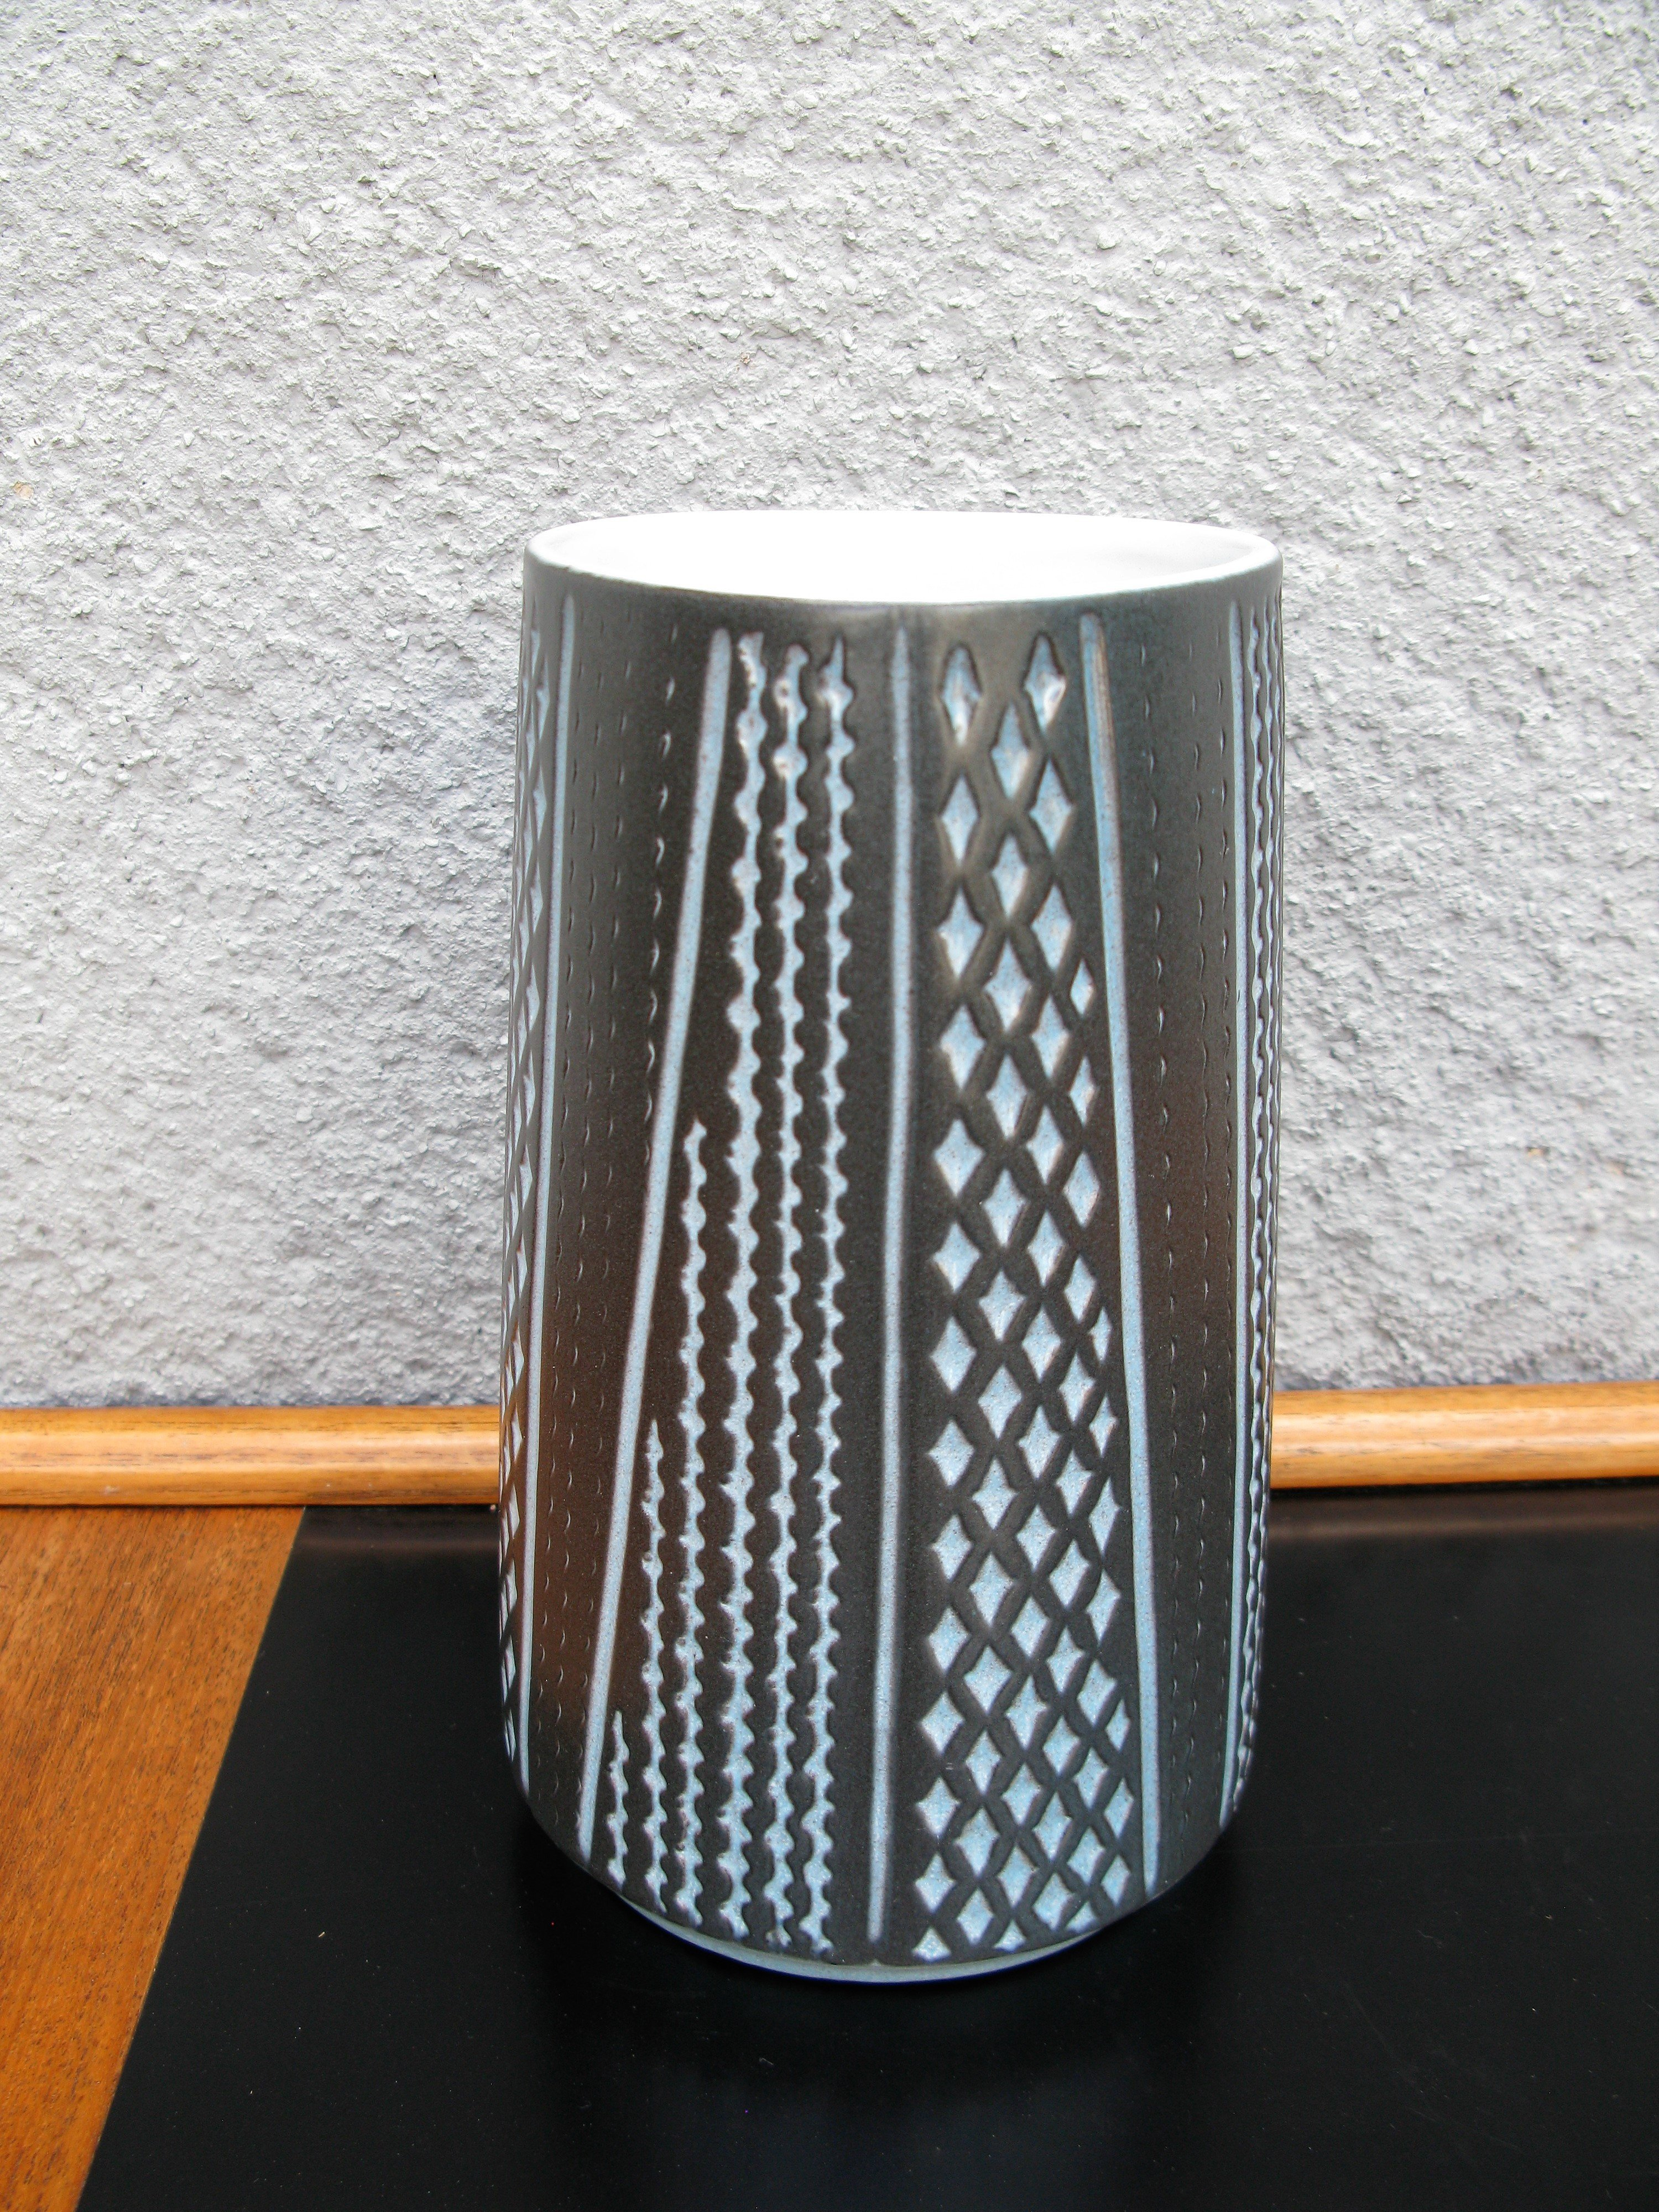 blue/grey vase 1034-138